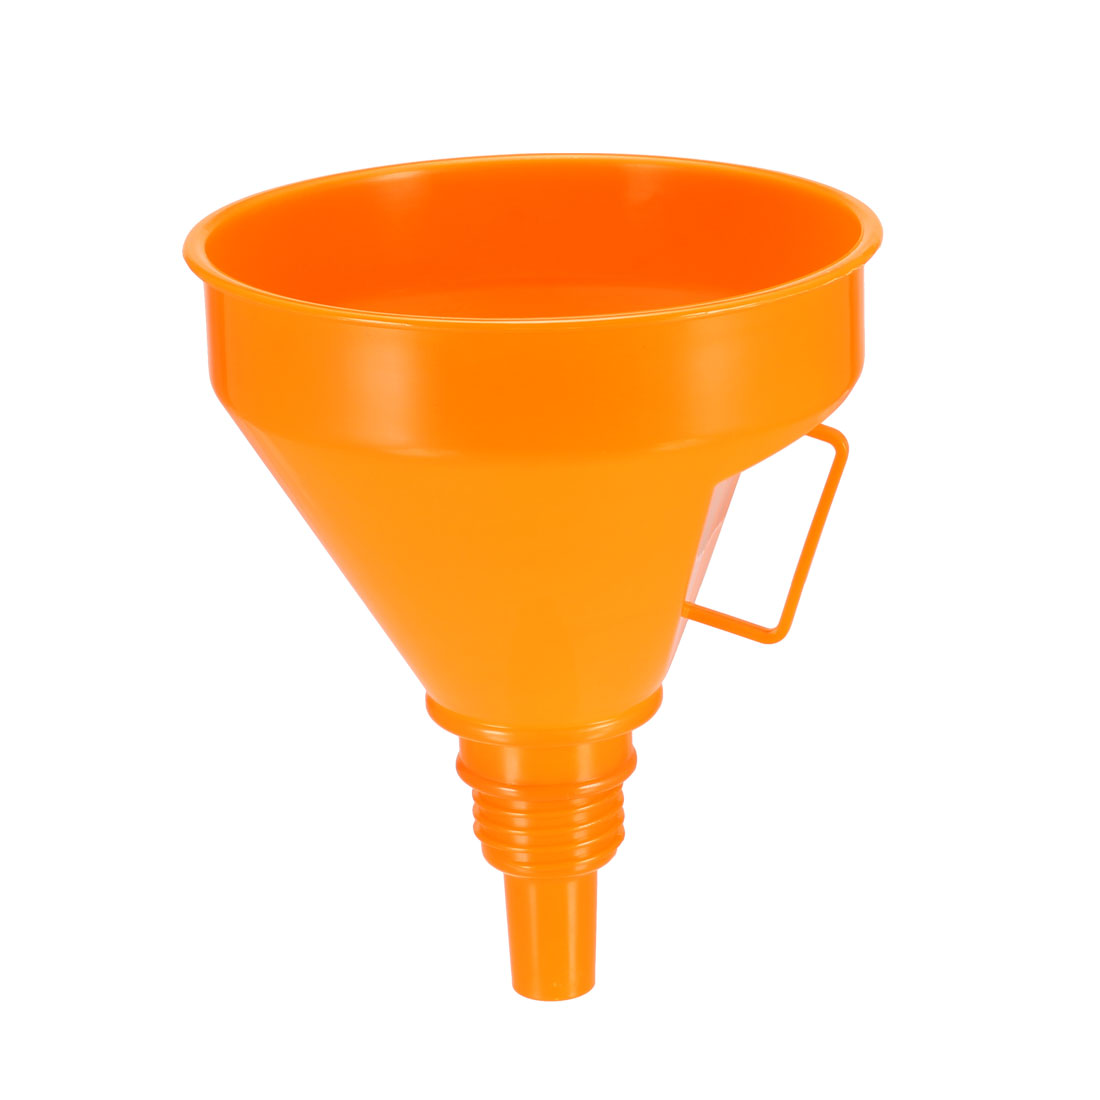 "Filter Funnel 5.3"" Plastic Feul Funnel Orange for Petrol Engine Oil Water Fuel"